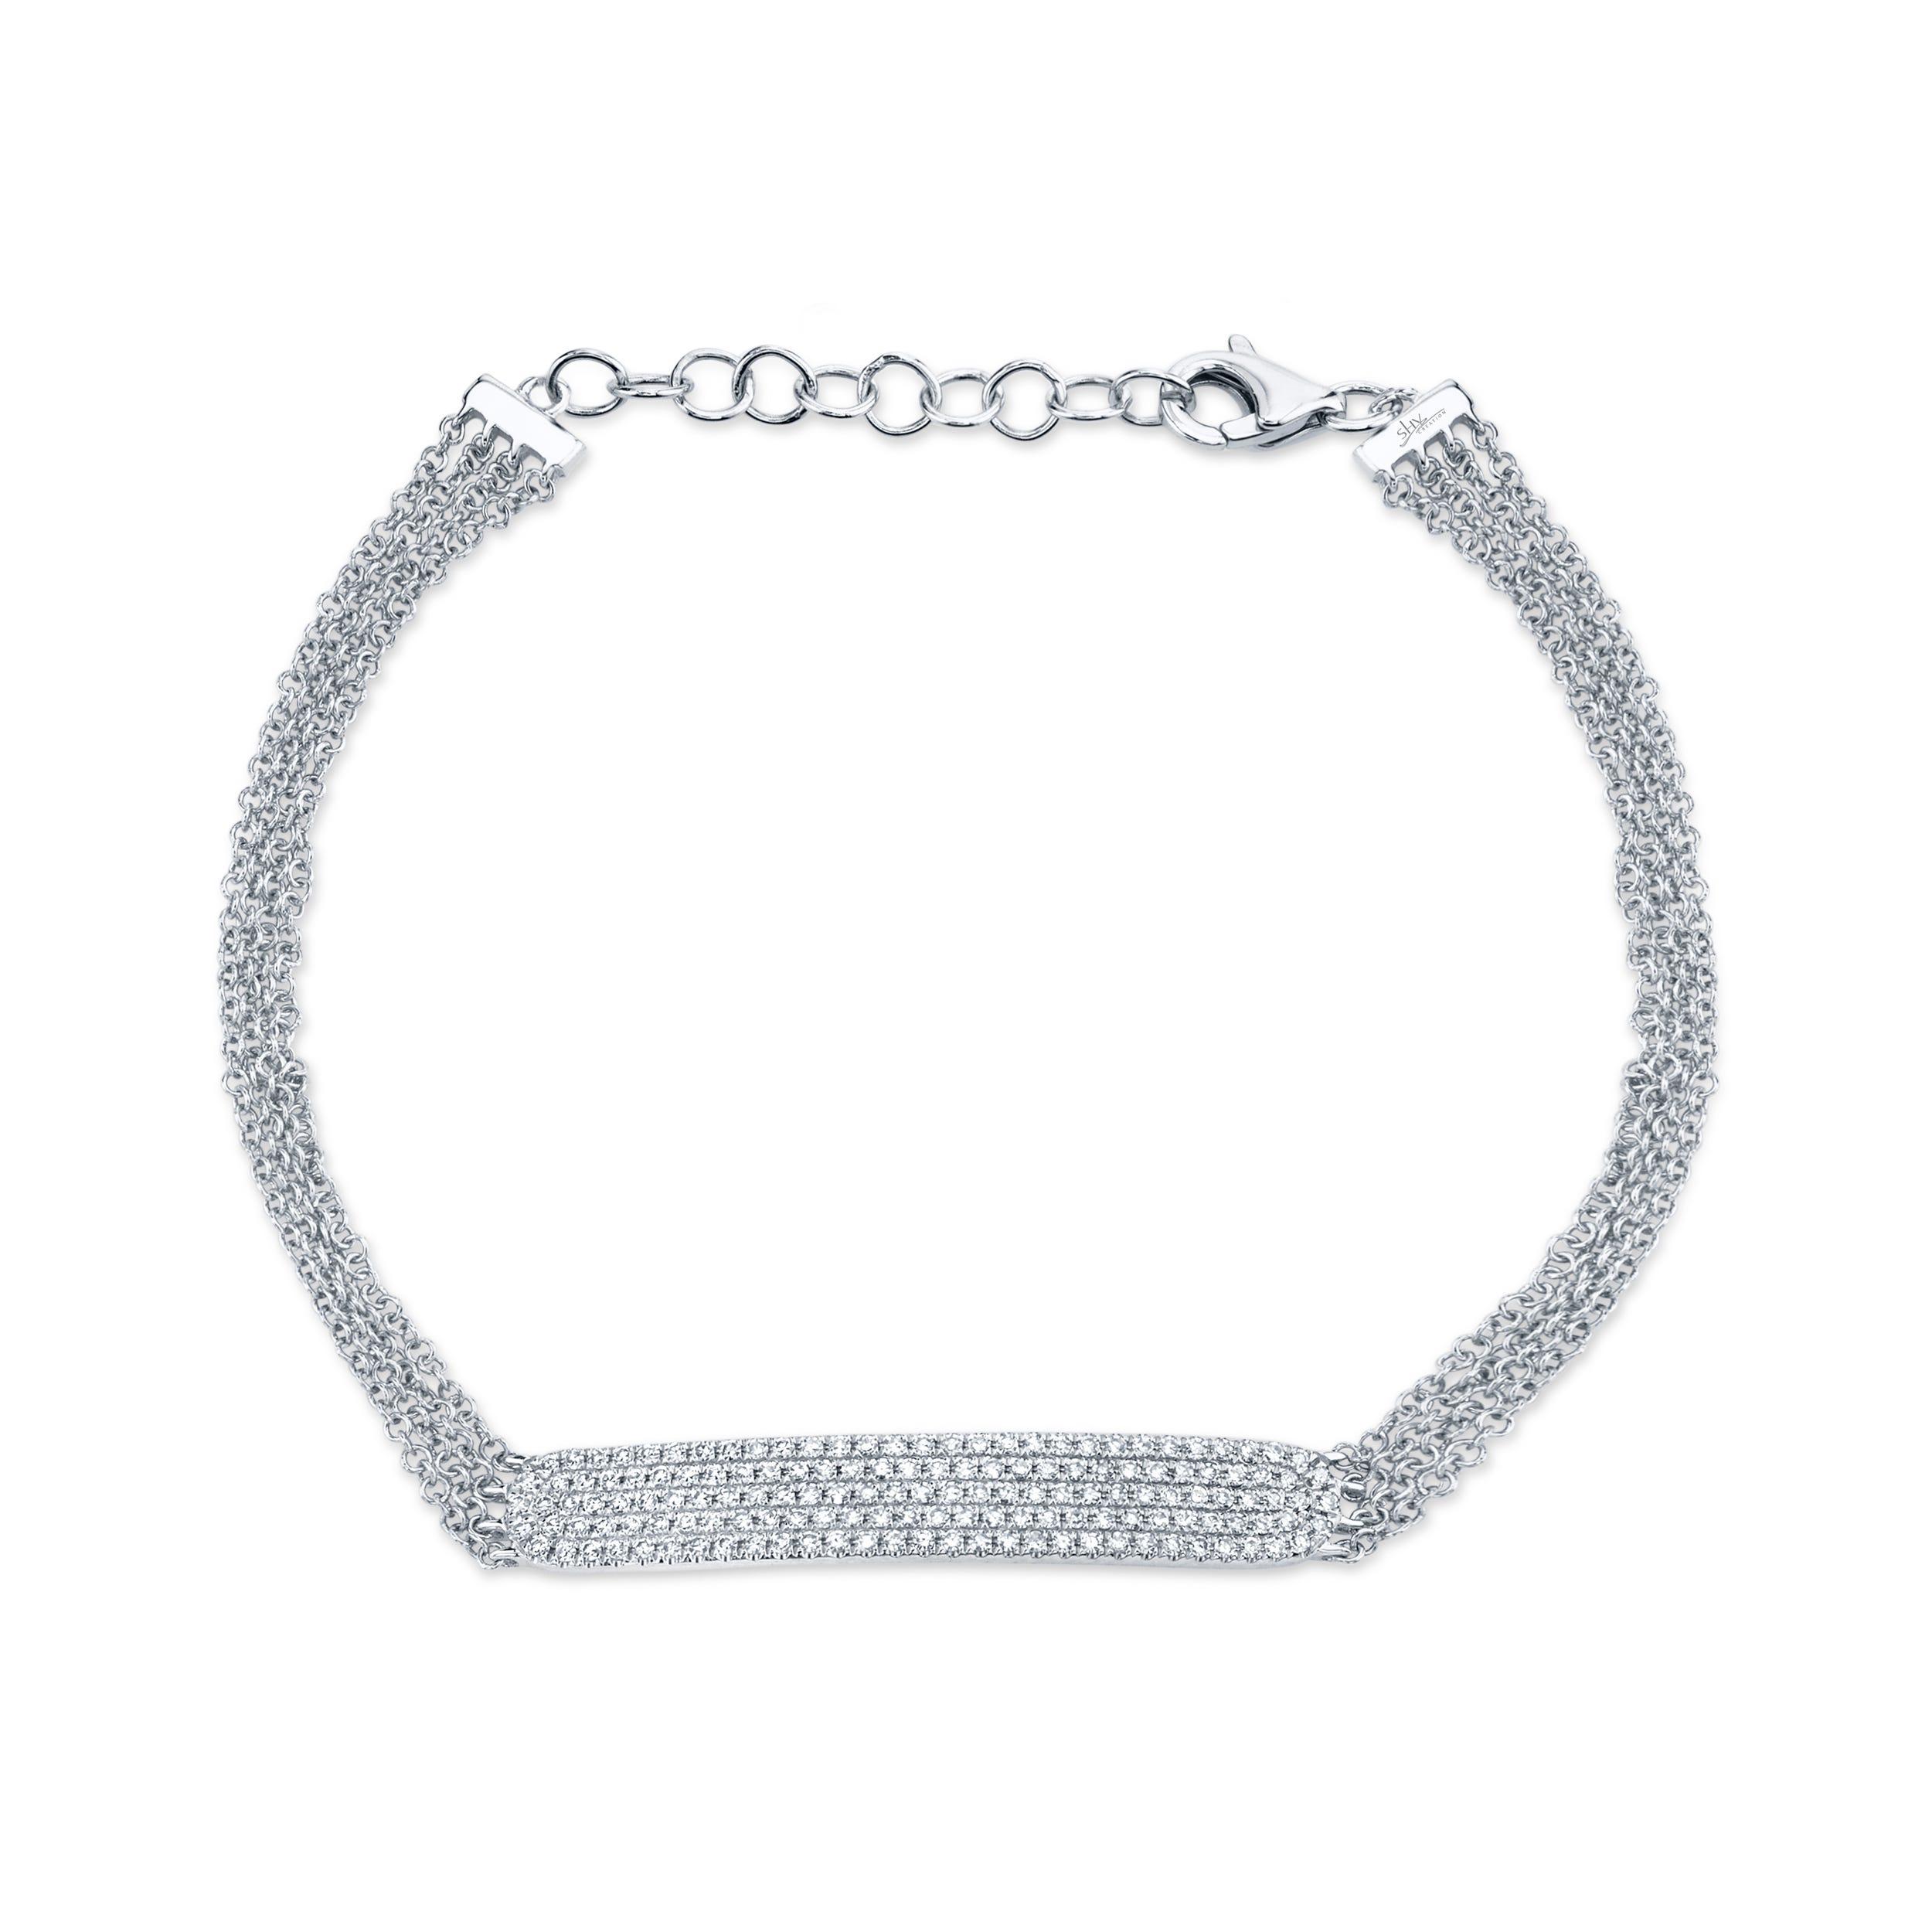 Shy Creation Diamond Pave ID Fashion Bracelet 3/8ctw in 14k White Gold SC55004406